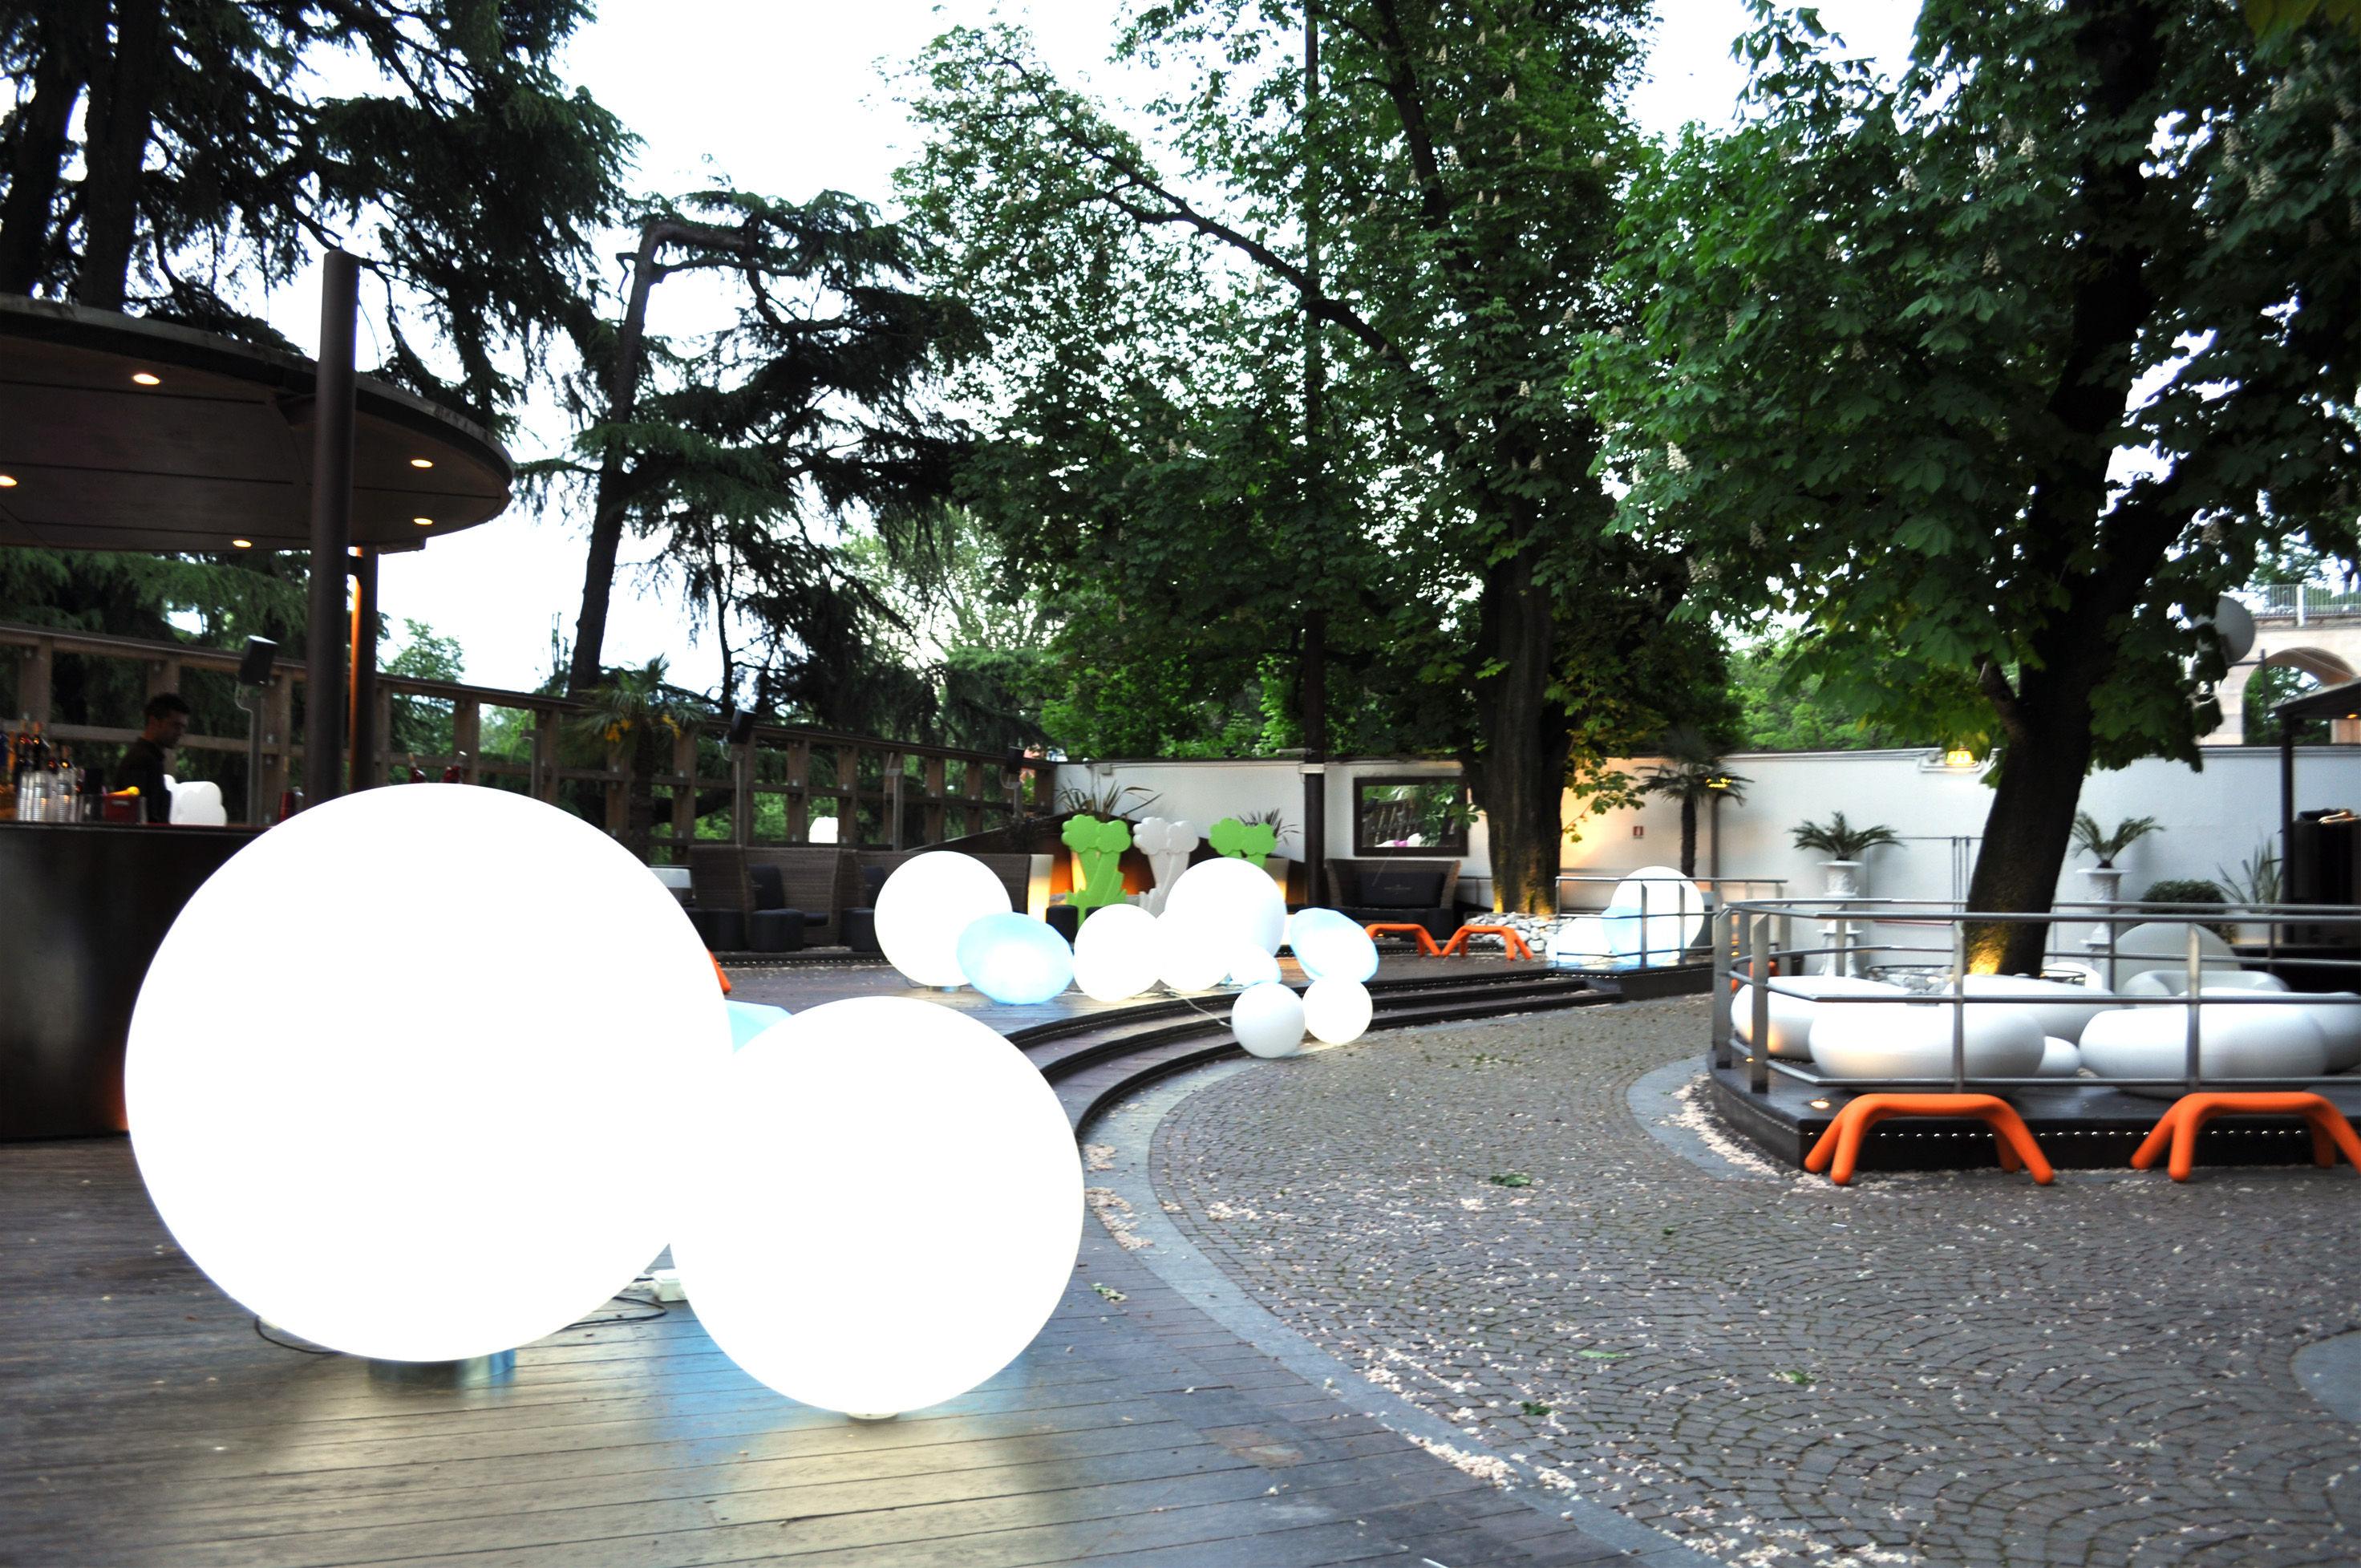 Lampada da tavolo globo outdoor slide bianco Ø 50 cm Ø 50